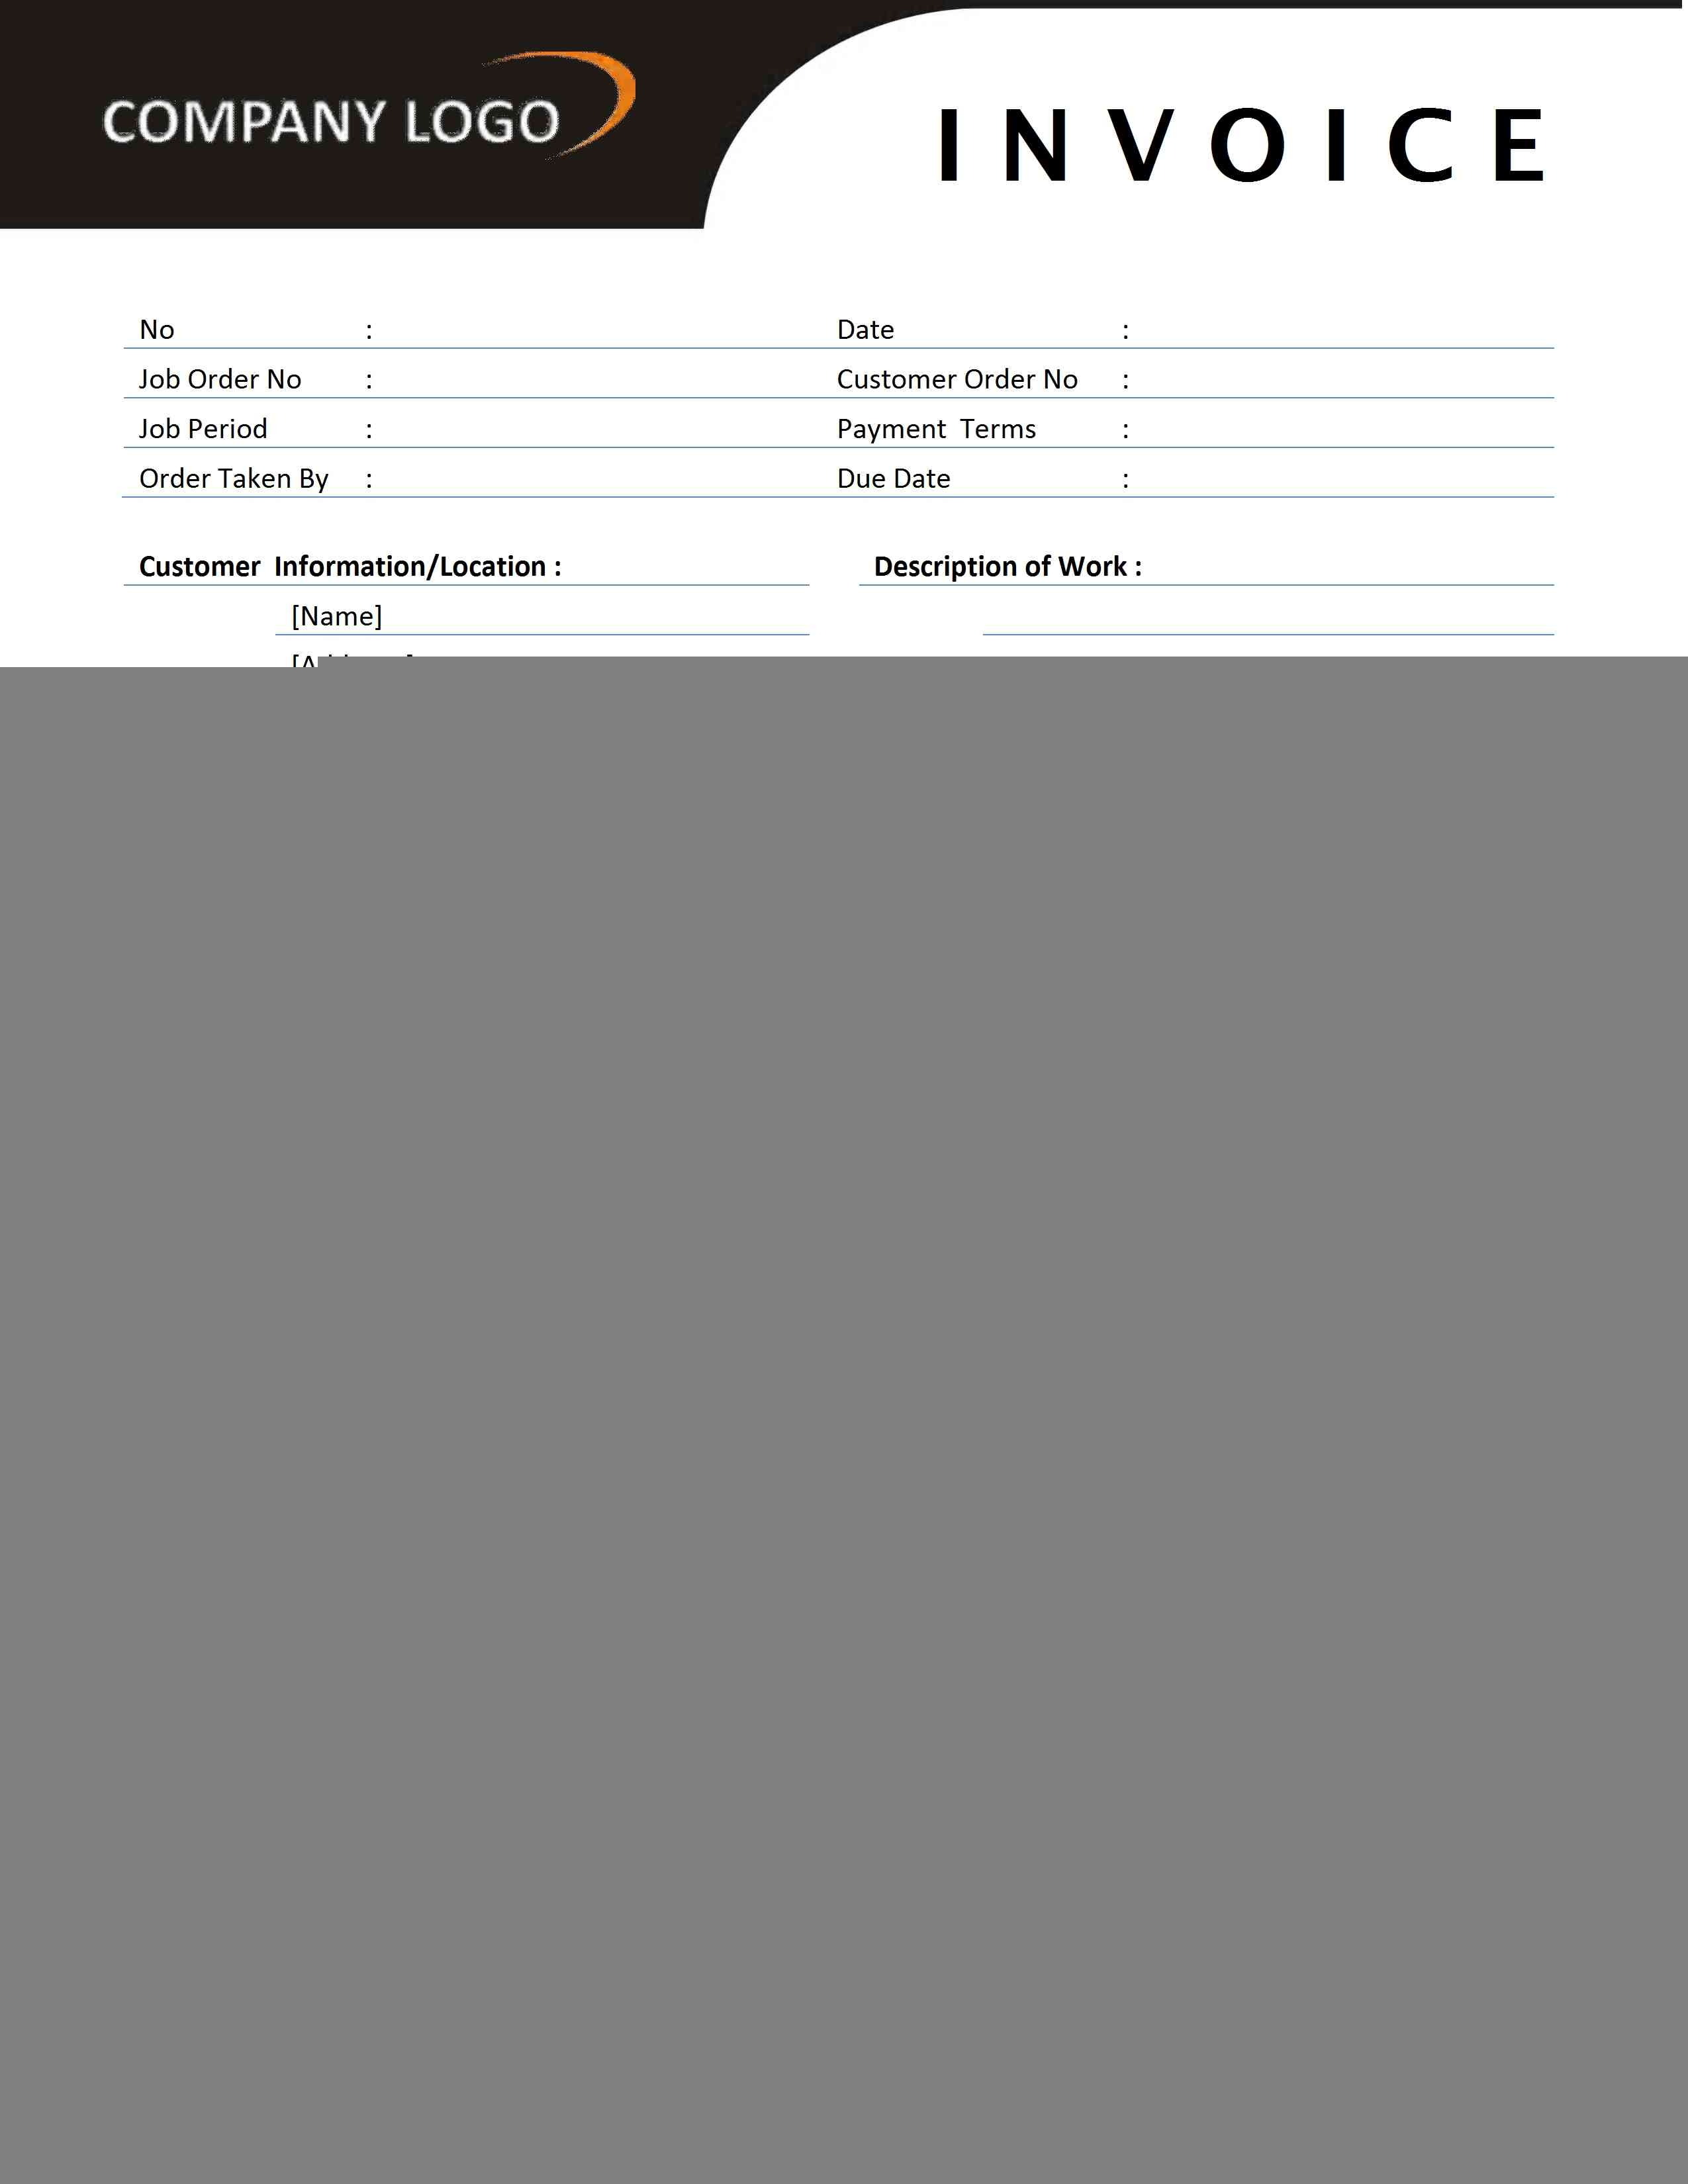 contractor invoice template free microsoft word templates contractor invoice template word